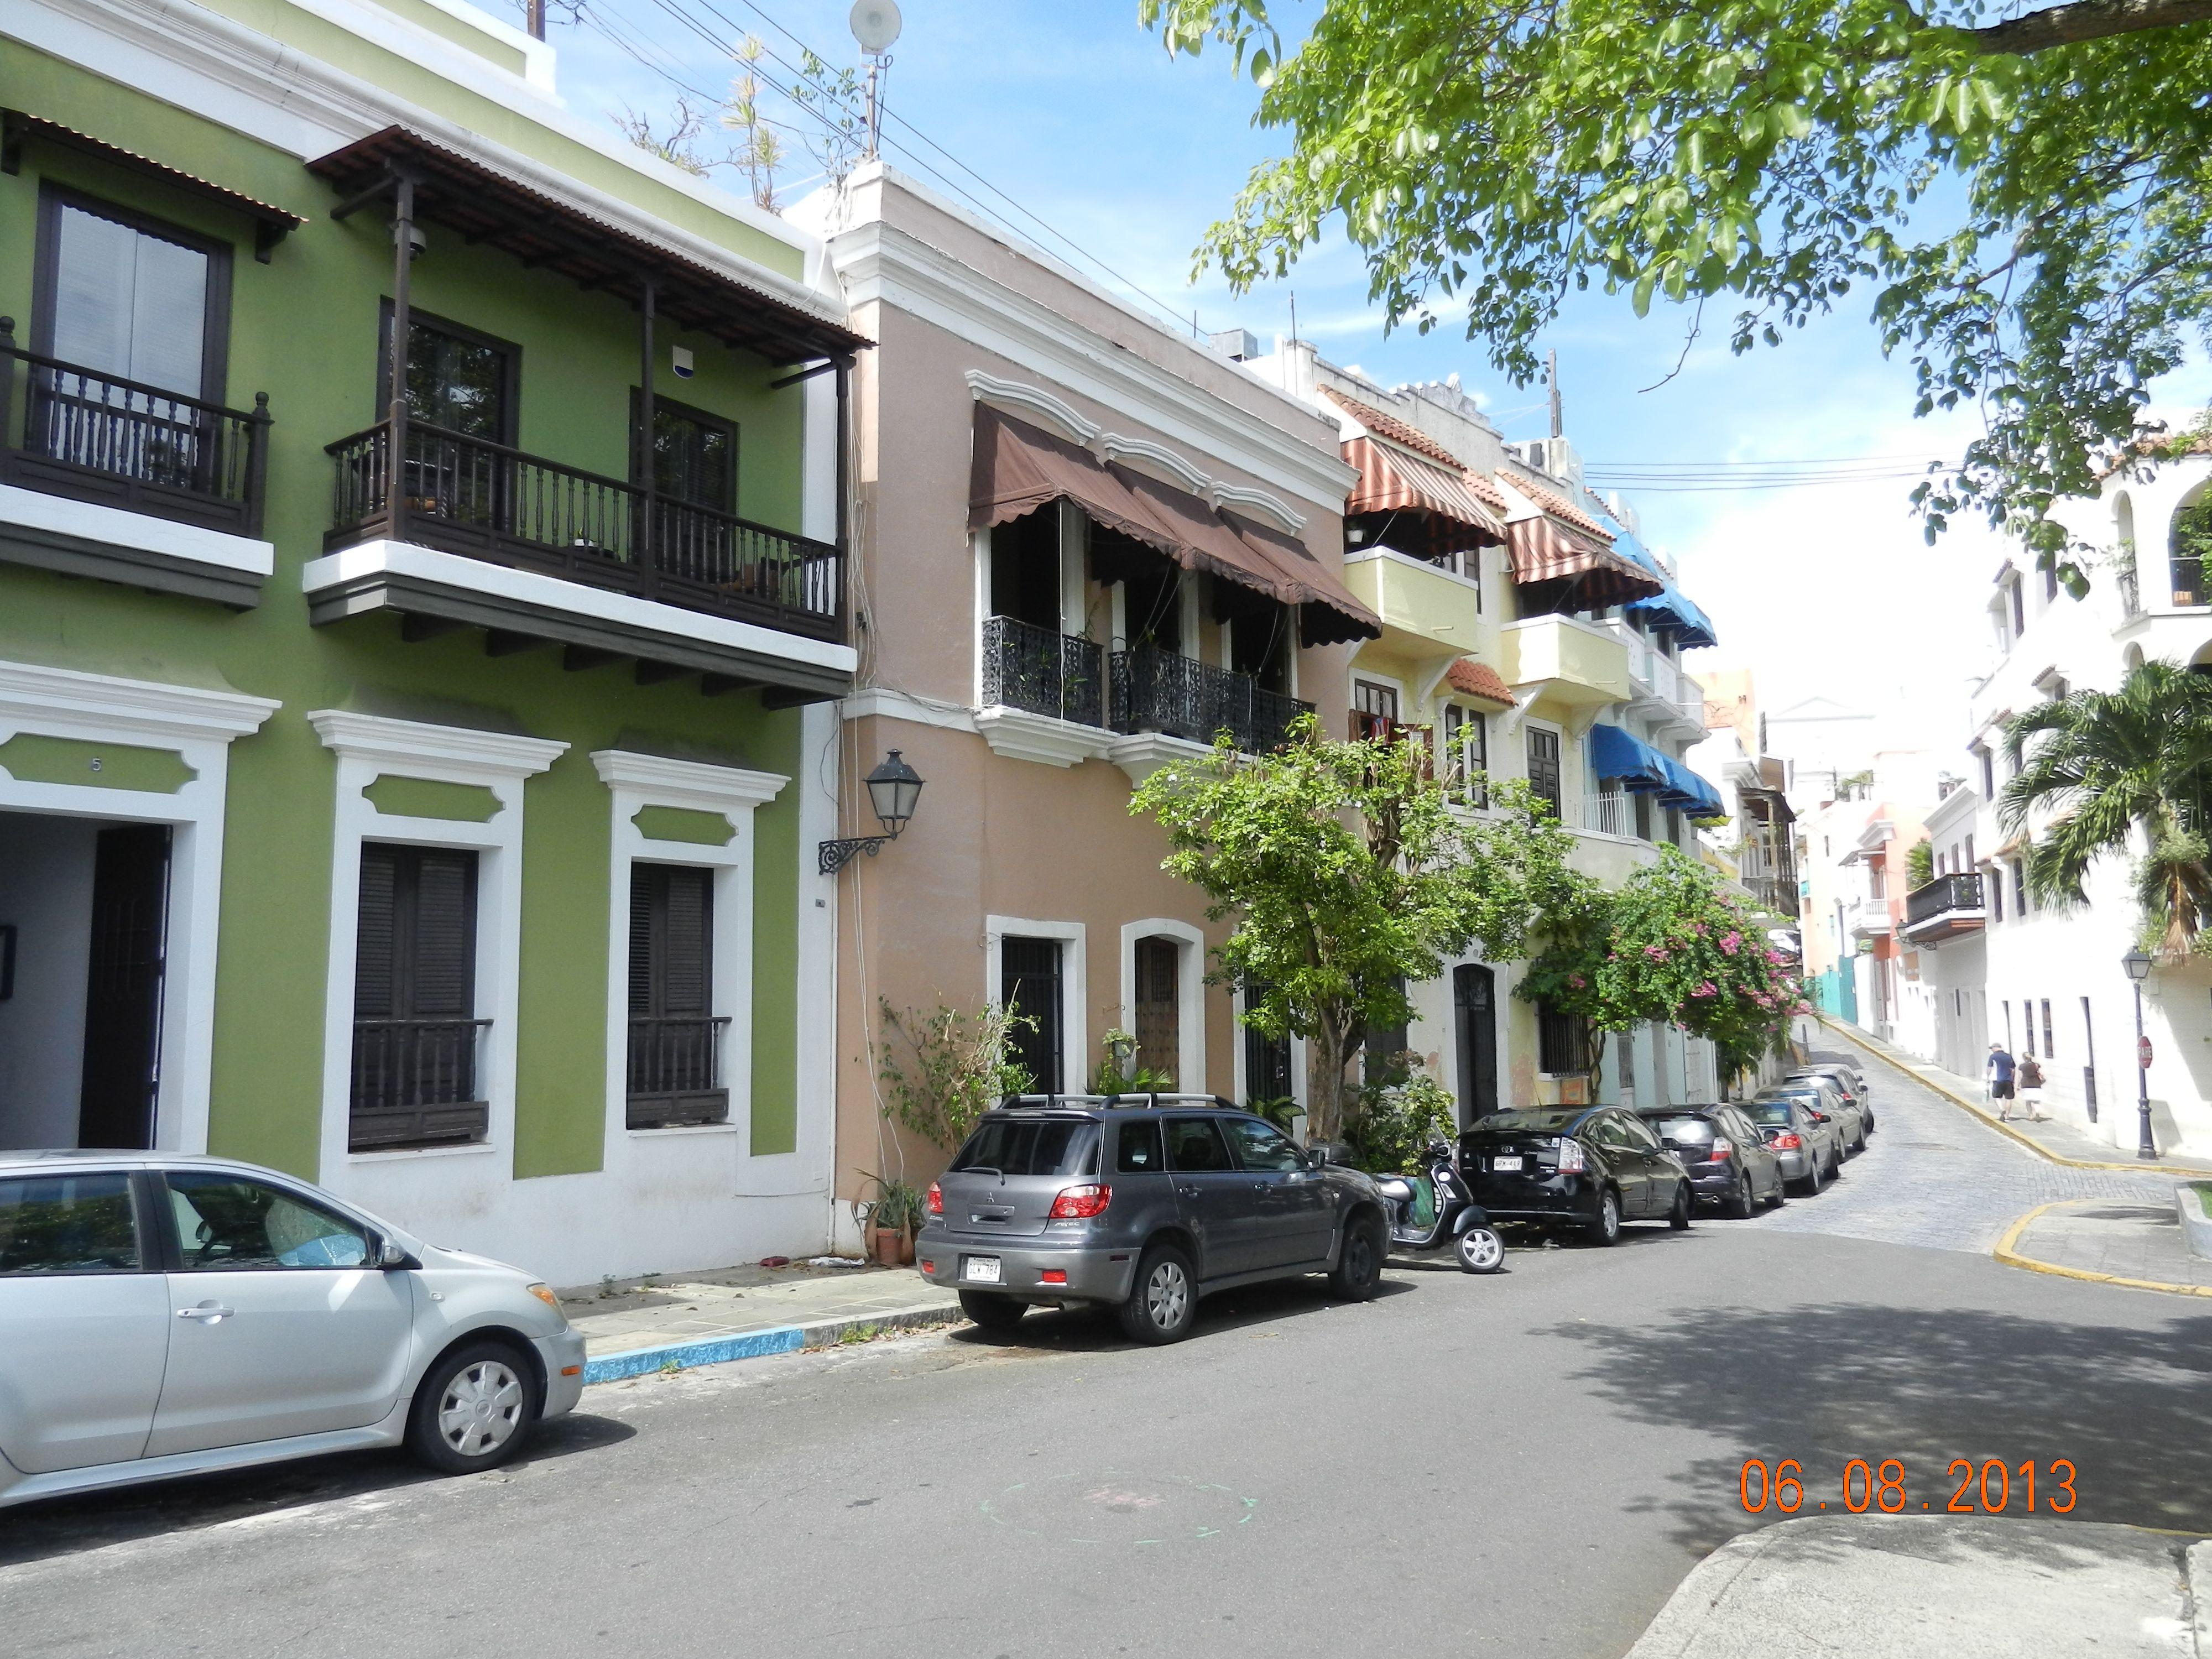 Calles del Viejo San Juan Street view, San, San juan